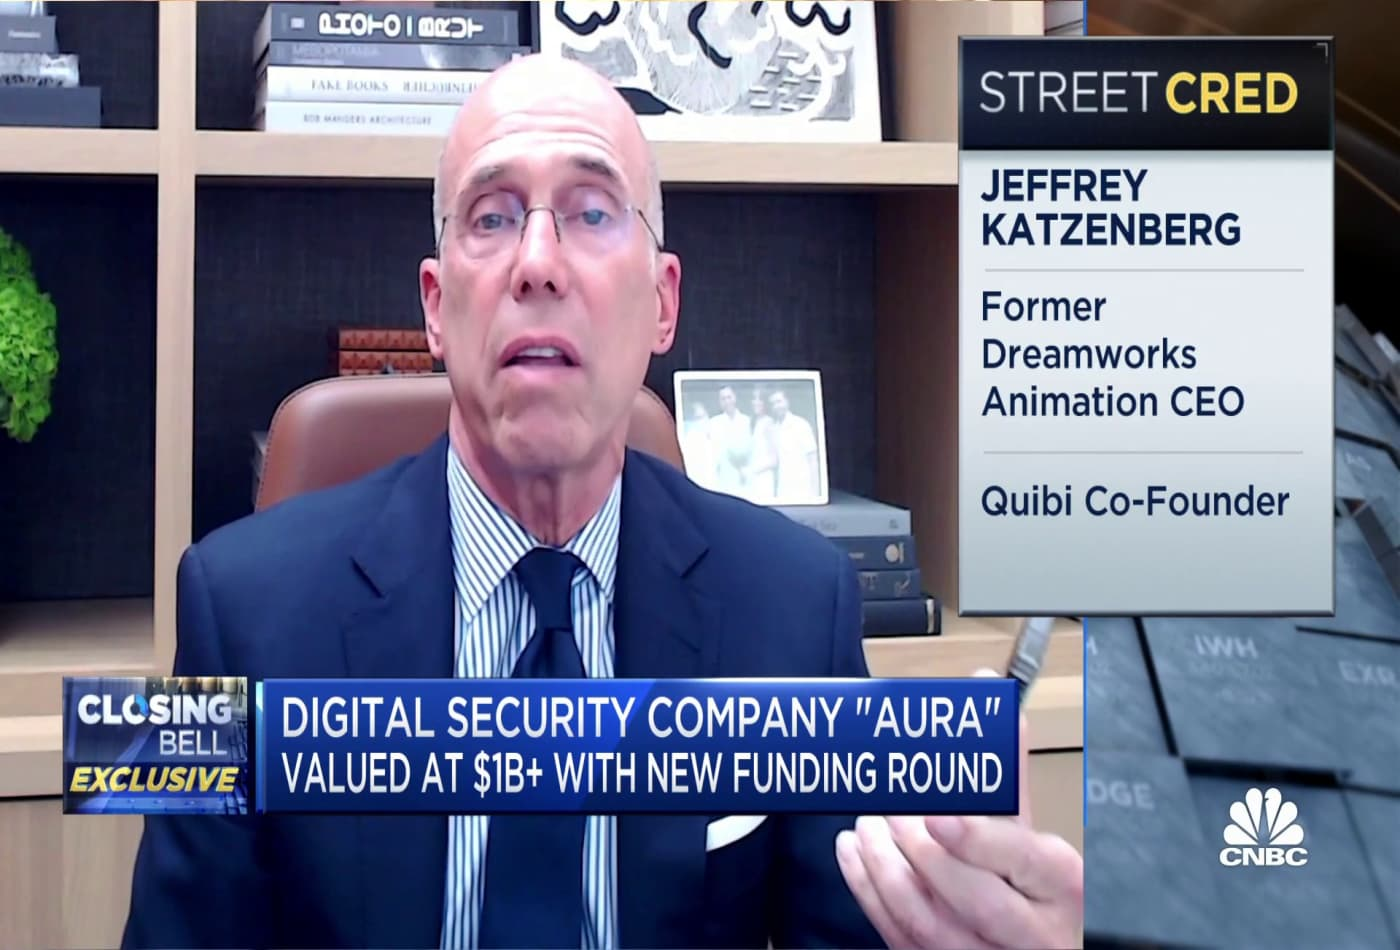 Katzenberg-backed digital security startup Aura valued at $1 billion after new round of funding